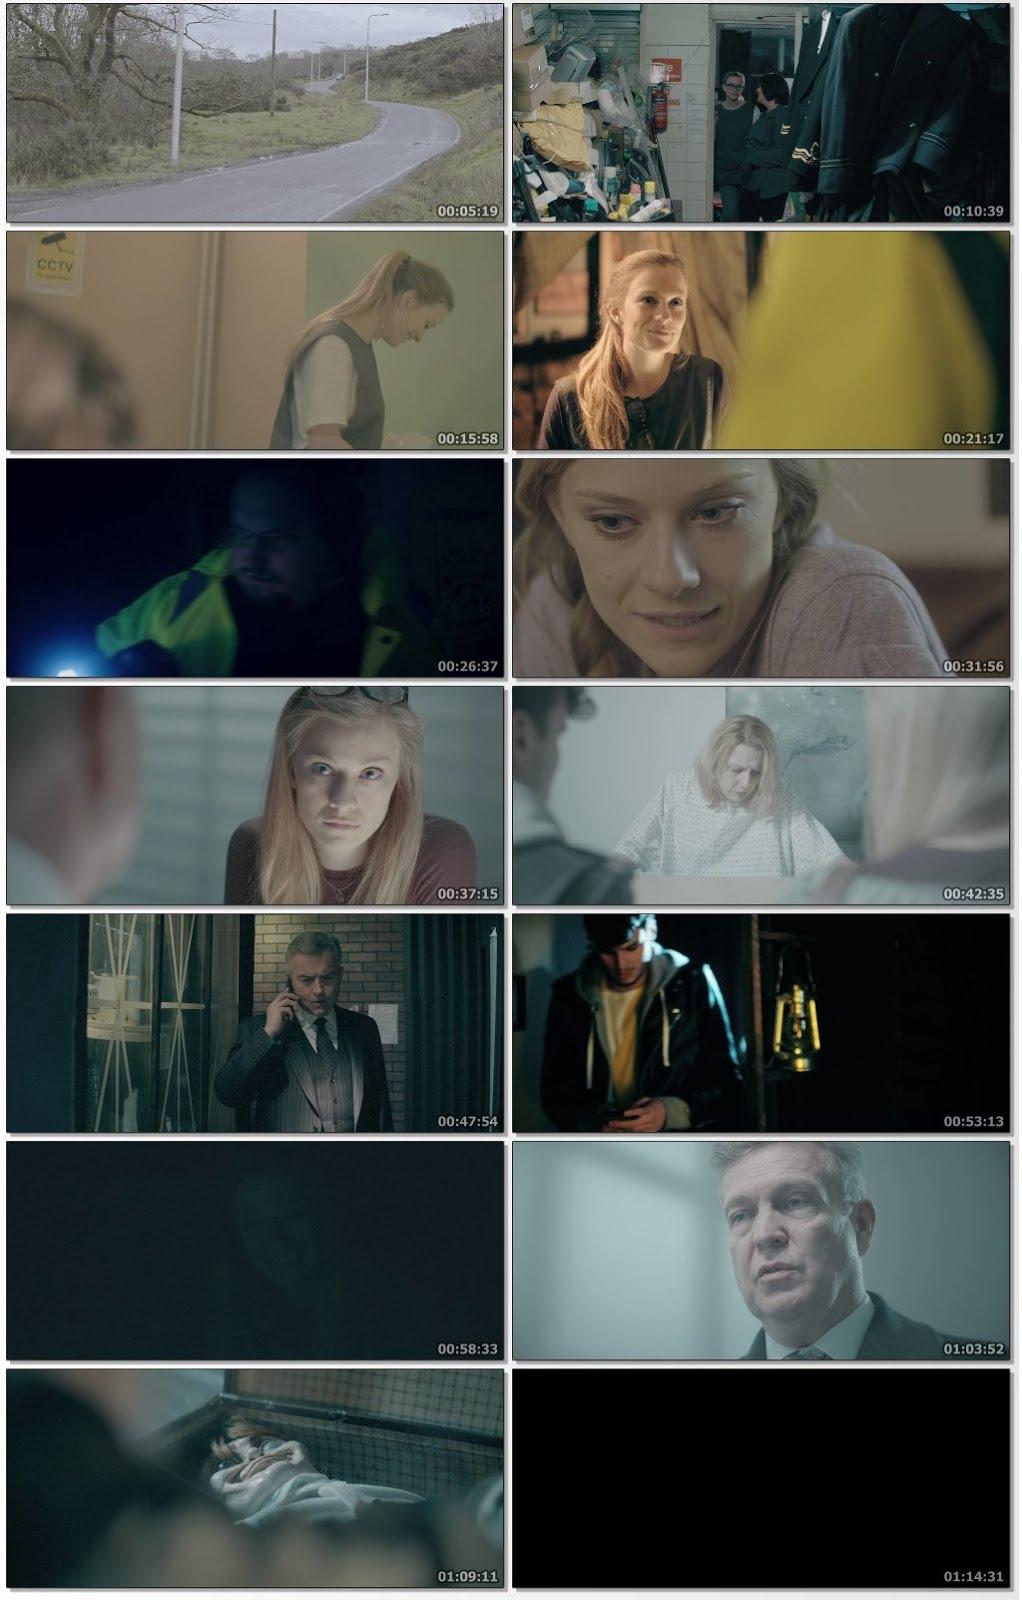 The-Curse-of-Robert-the-Doll-2016-Dual-Audio-Hindi-www-9kmovies-name-720p-Blu-Ray-ESubs-1-1-GB-mkv-t